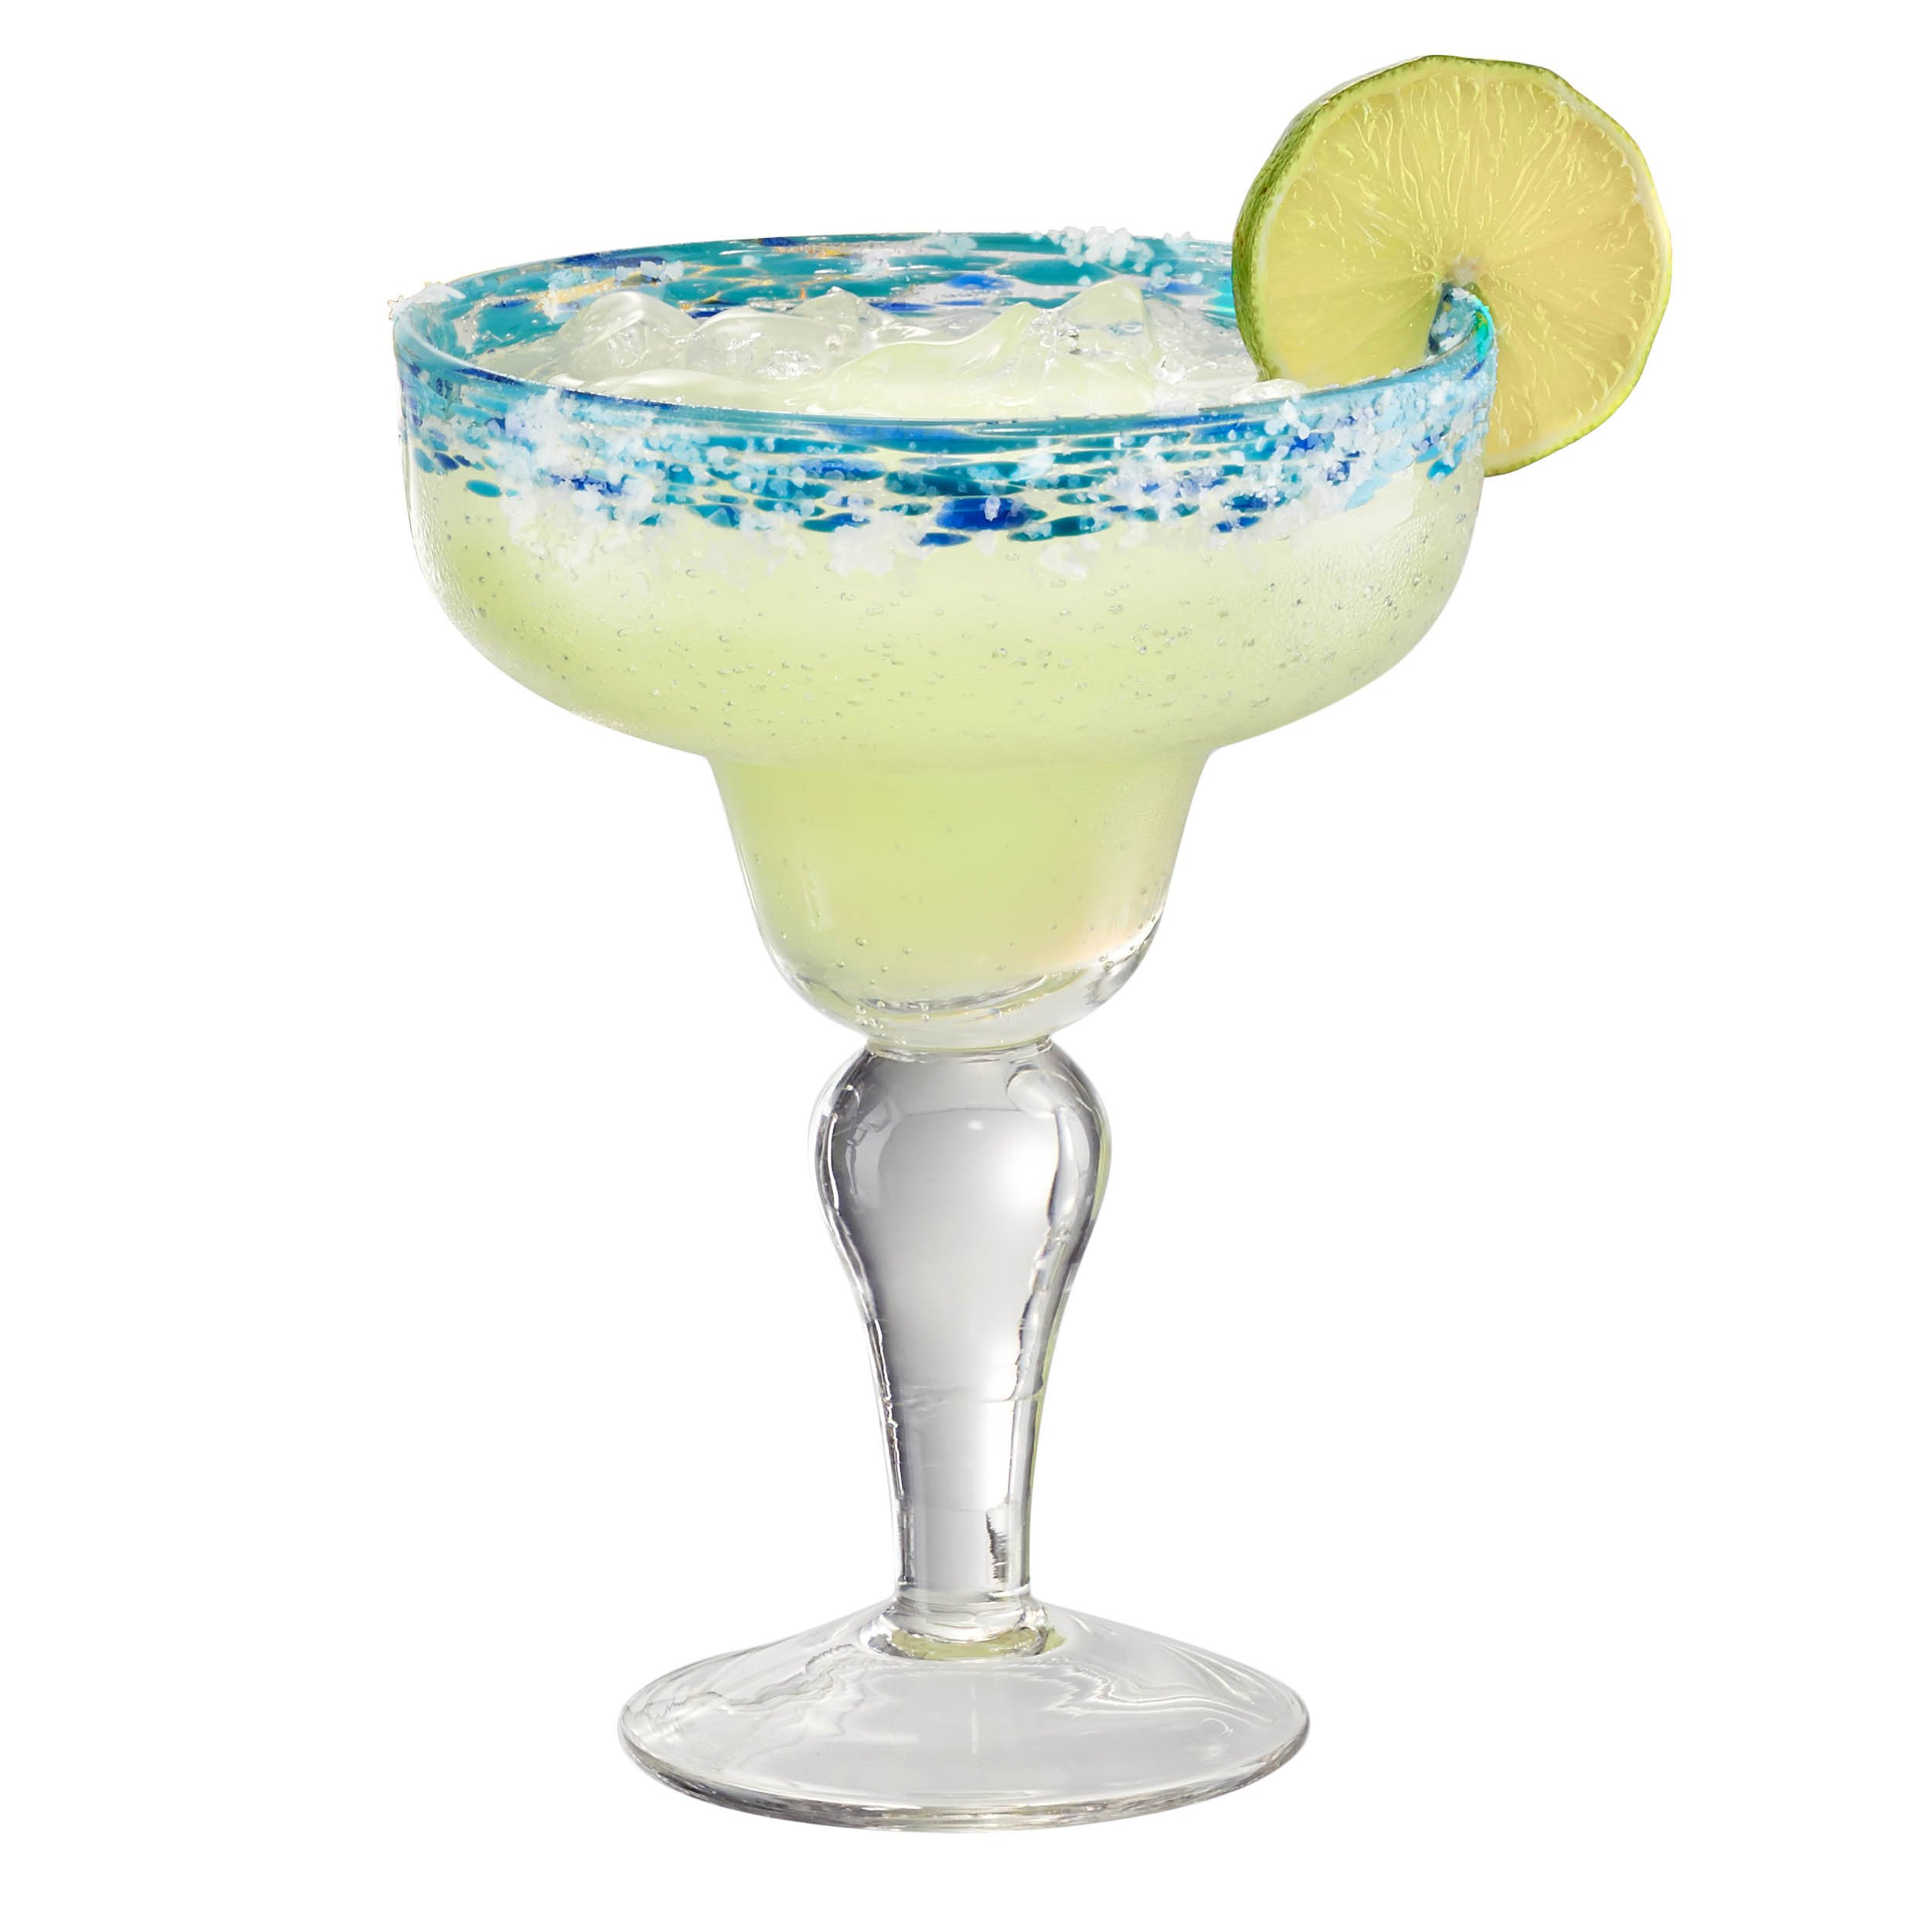 Artland Mingle Margarita Glasses (Set of 4), Turquoise Rim by ARTLAND